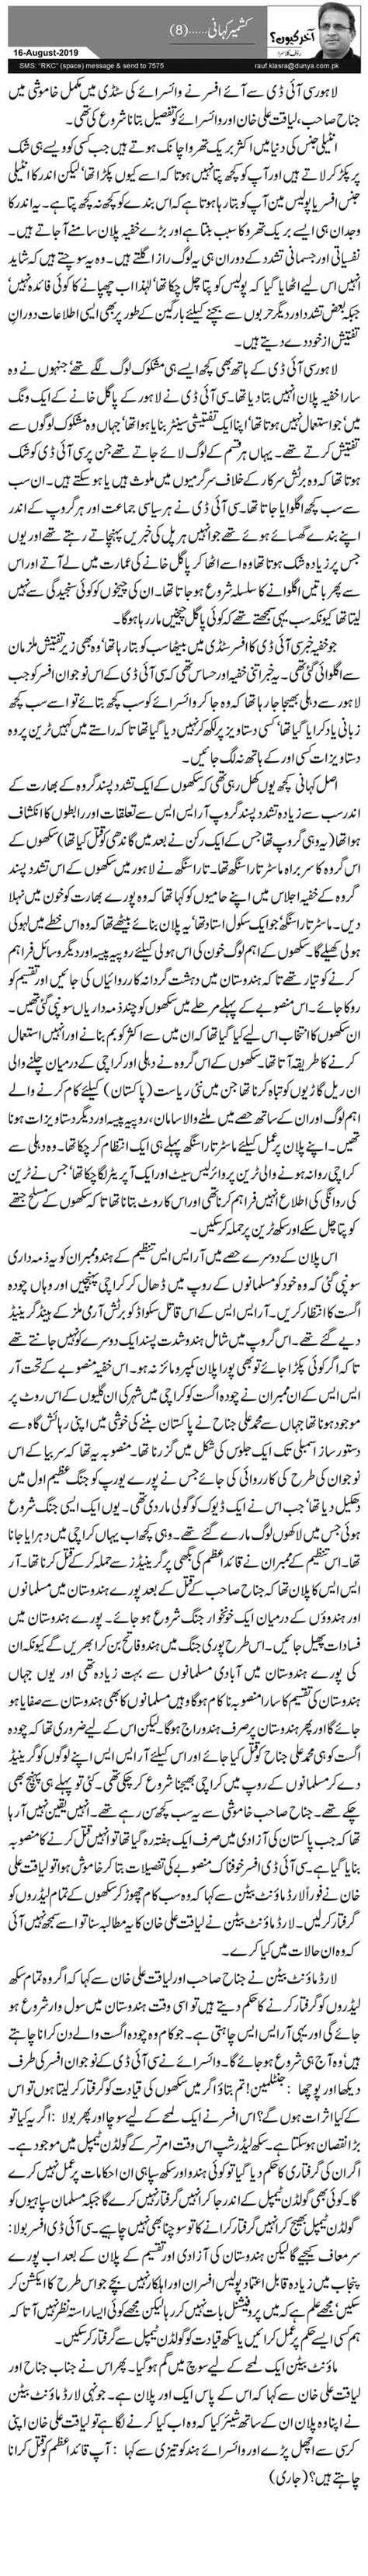 Kashmir Kahani (9) By Rauf Klasra (Dated: Saturday, August 17, 2019)